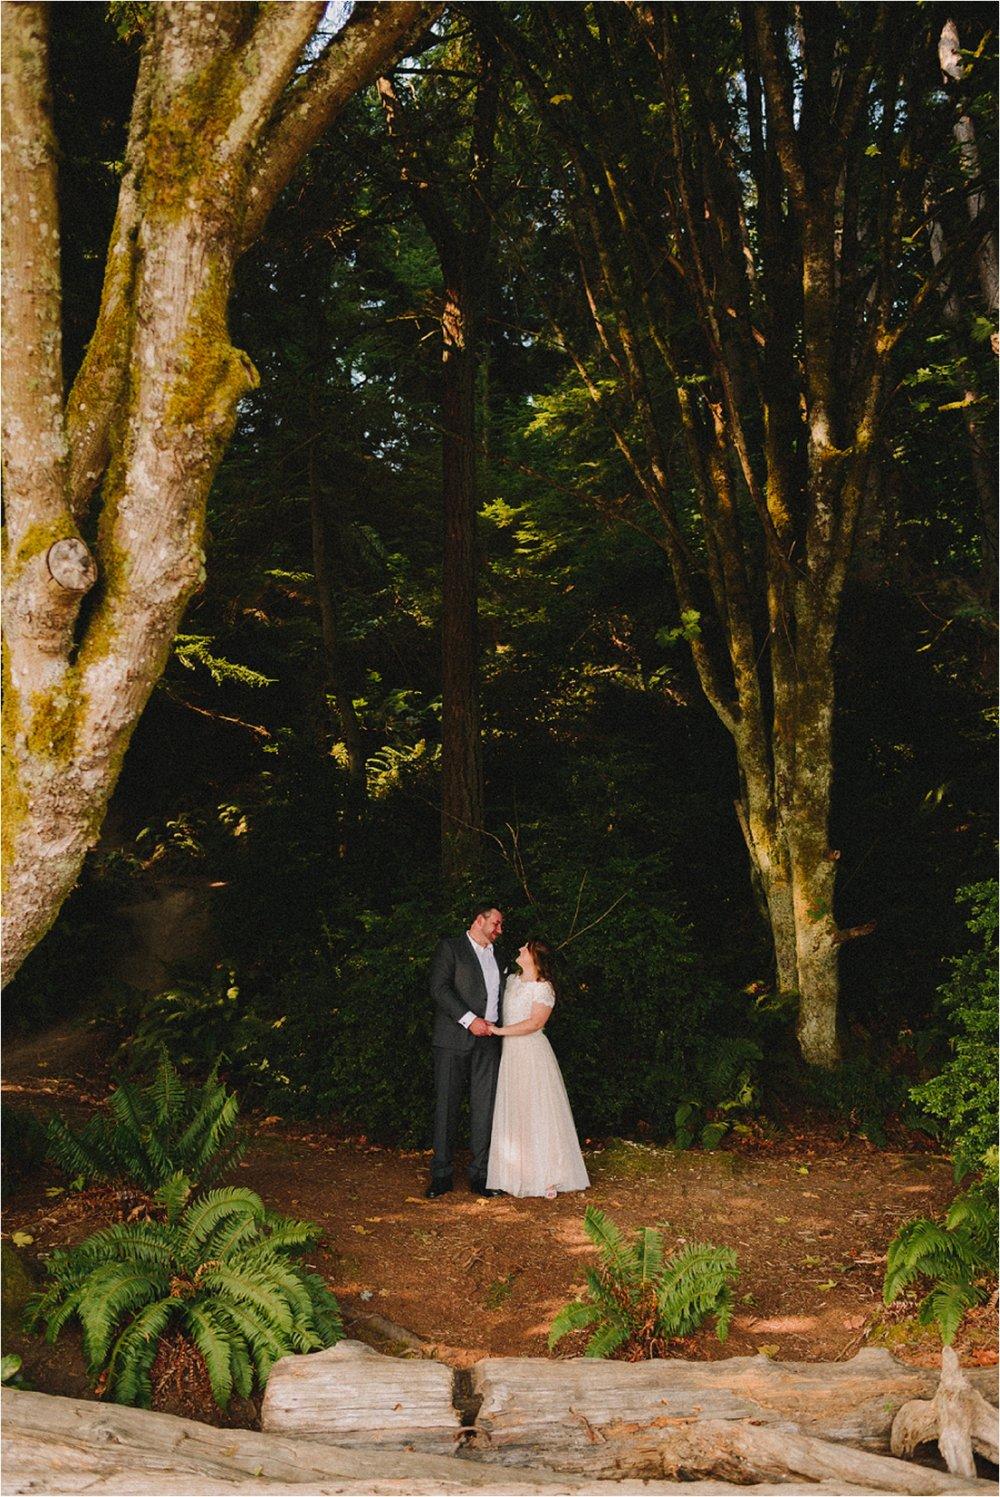 owen-beach-priest-point-park-tacoma-washington-elopement-jannicka-mayte-anchorage-alaska-wedding-elopement-photographer (1).jpg